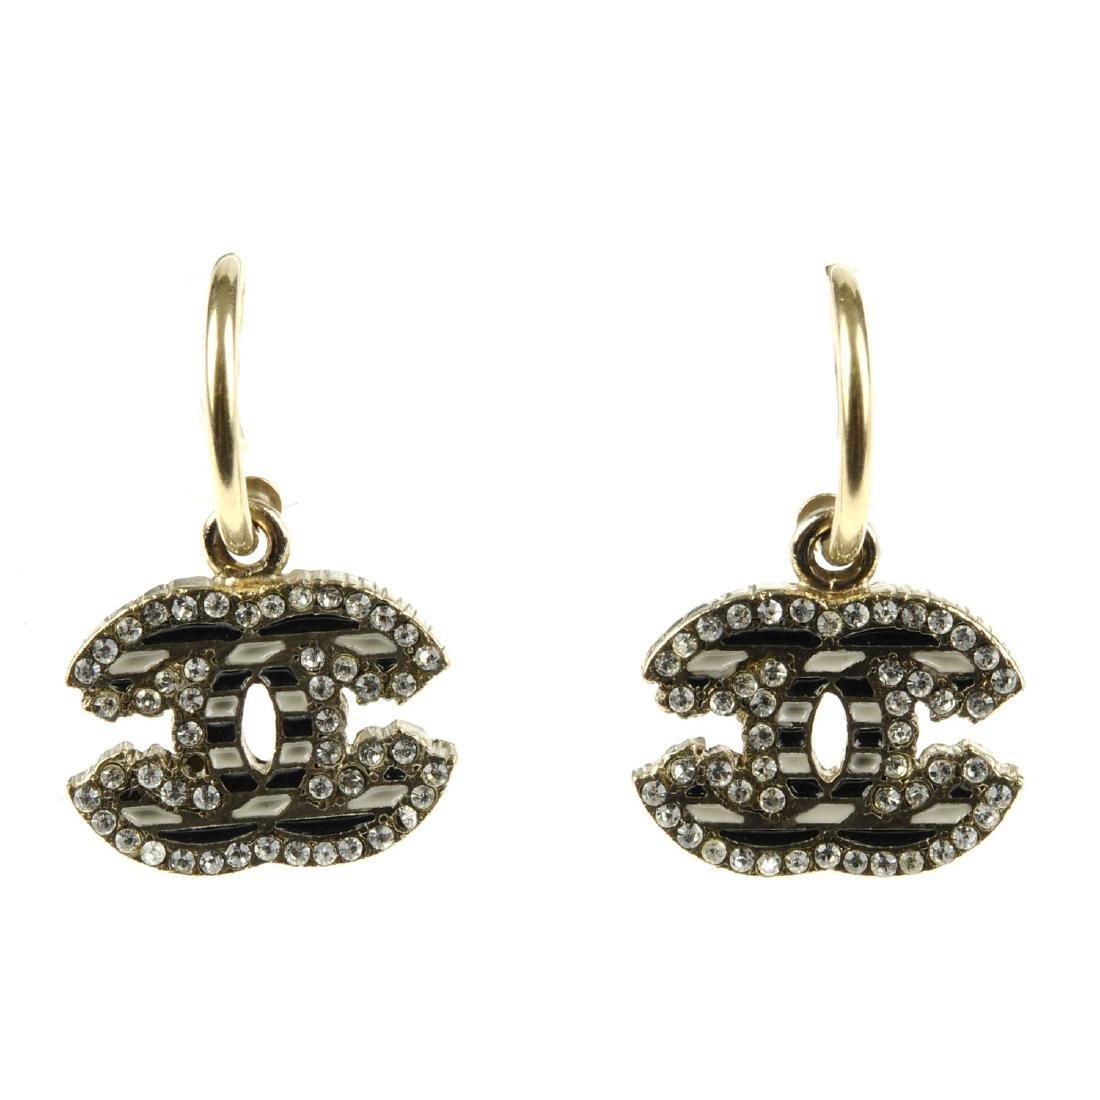 CHANEL - a pair of earrings. Designed as hoops,